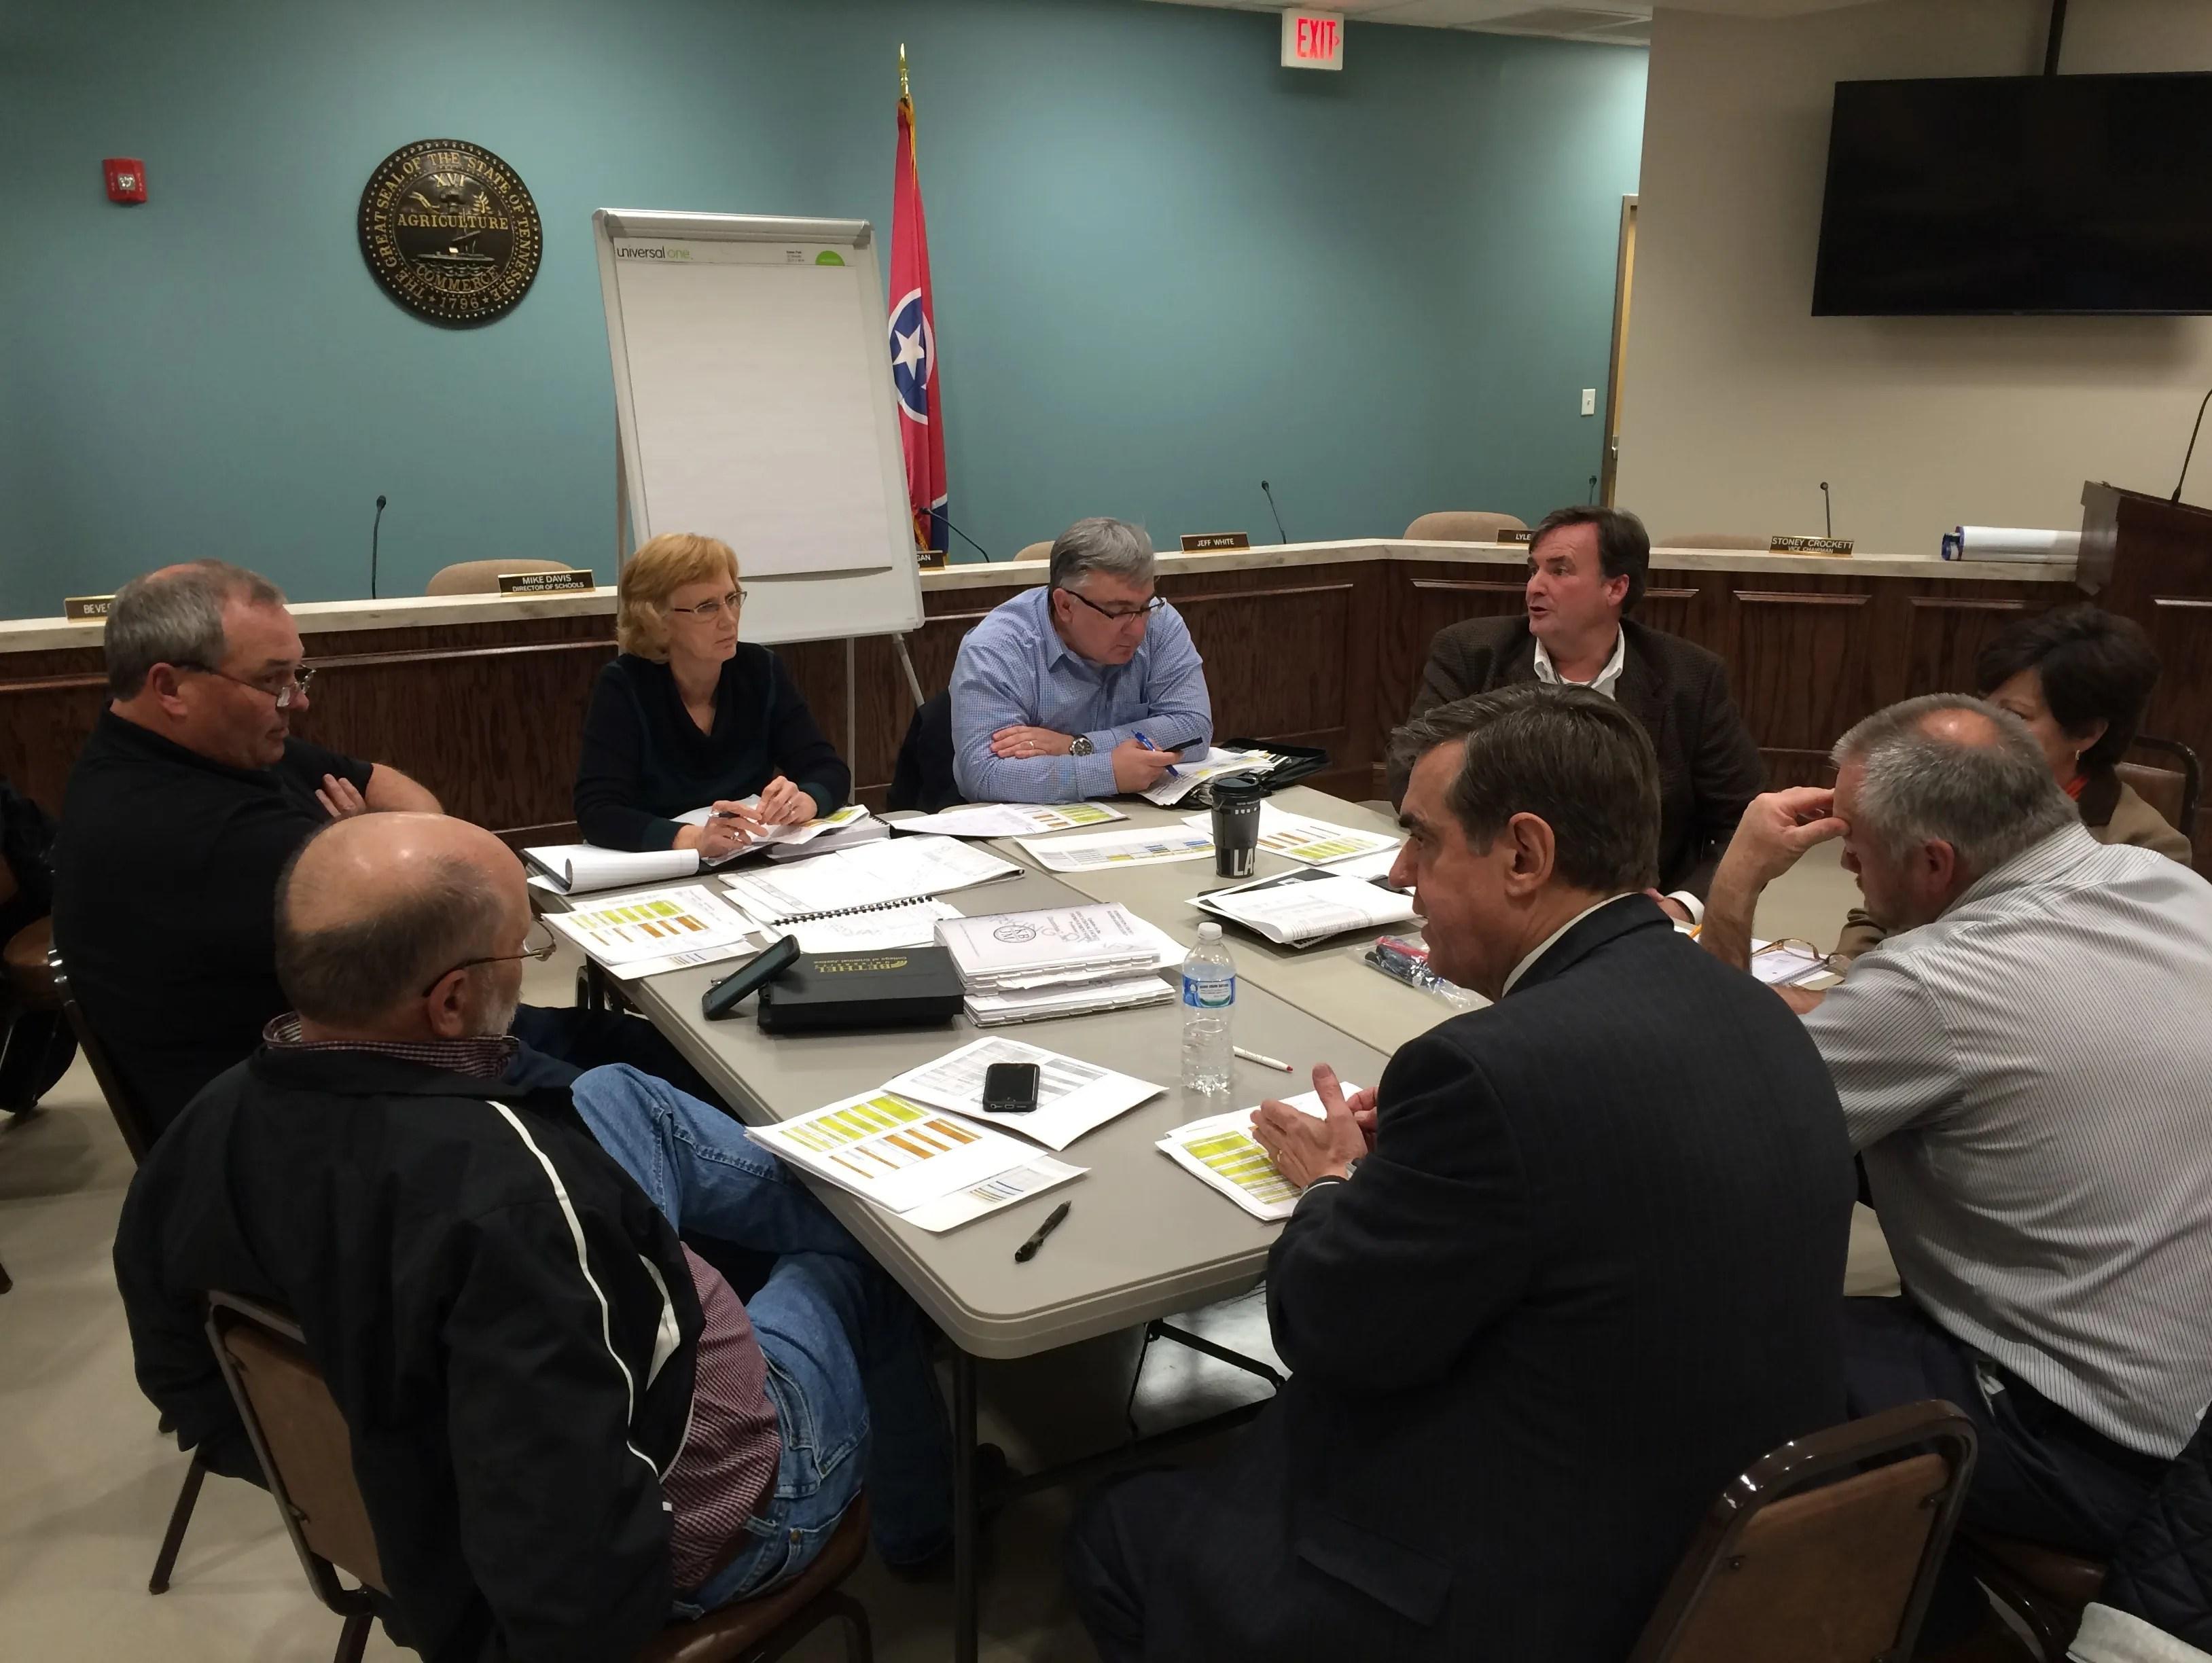 Robertson County Schools plans county athletic director job